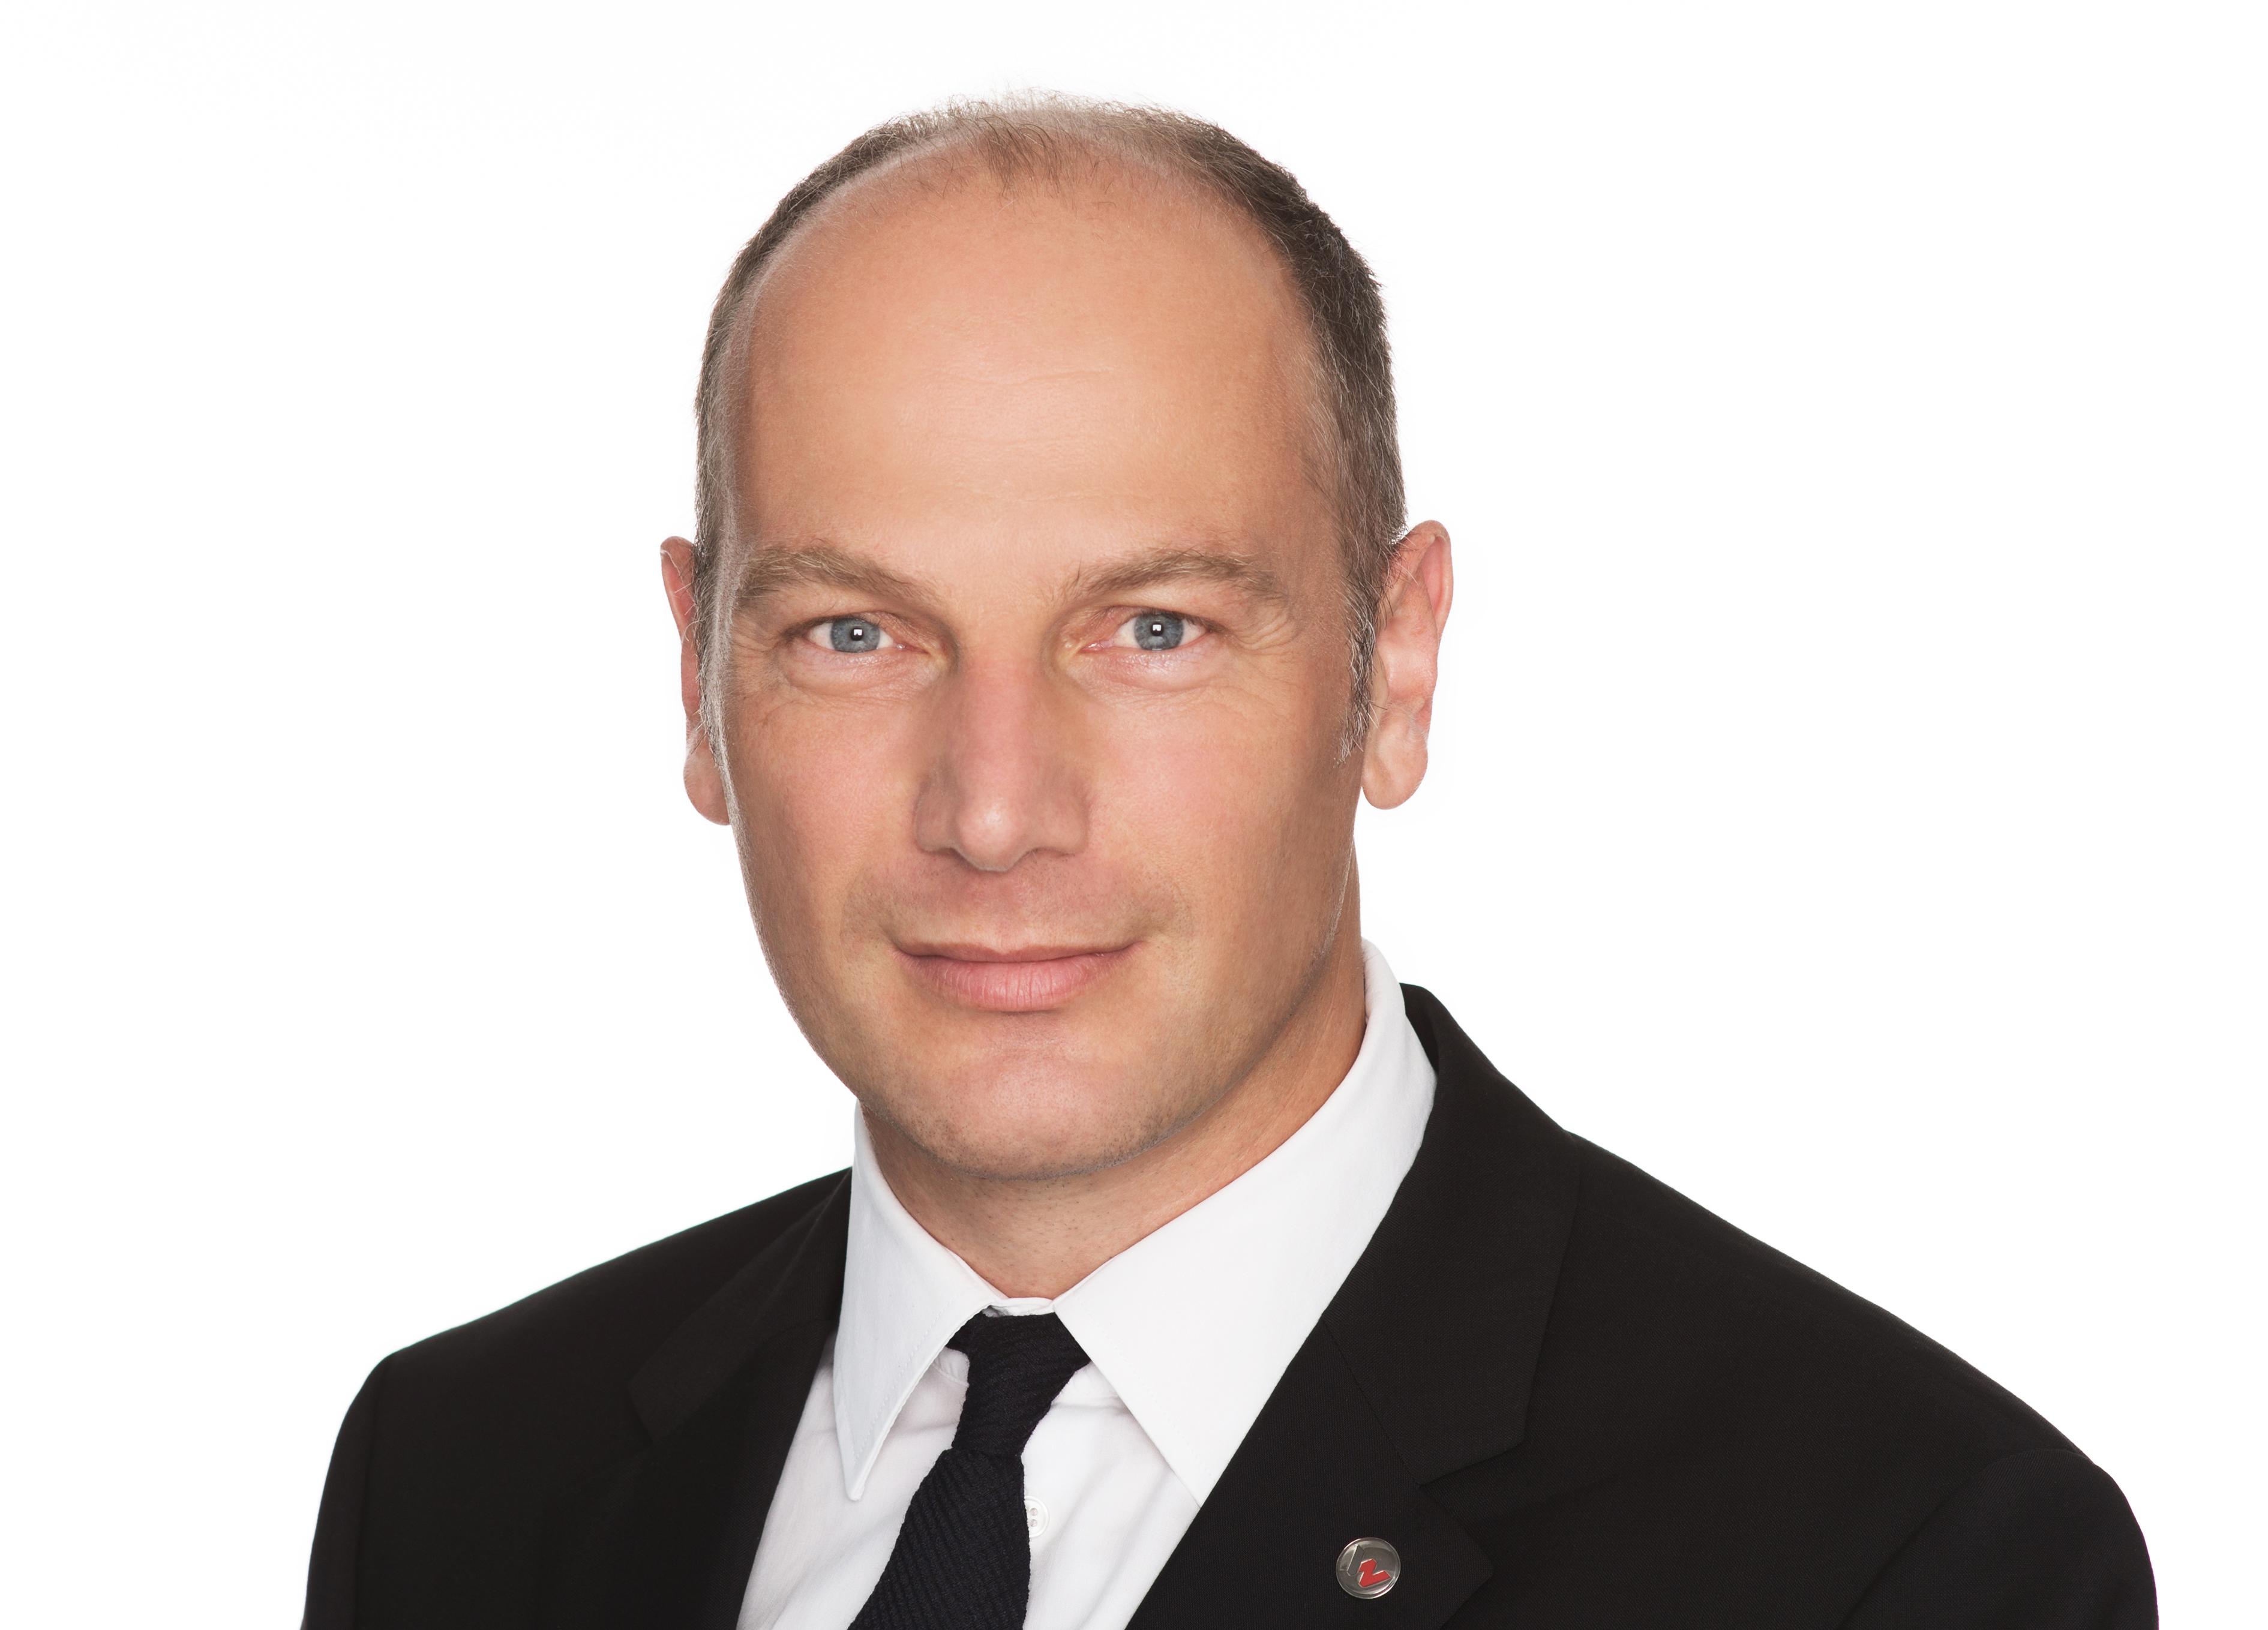 Alexander Greschner neuer Vertriebsvorstand bei Wacker Neuson